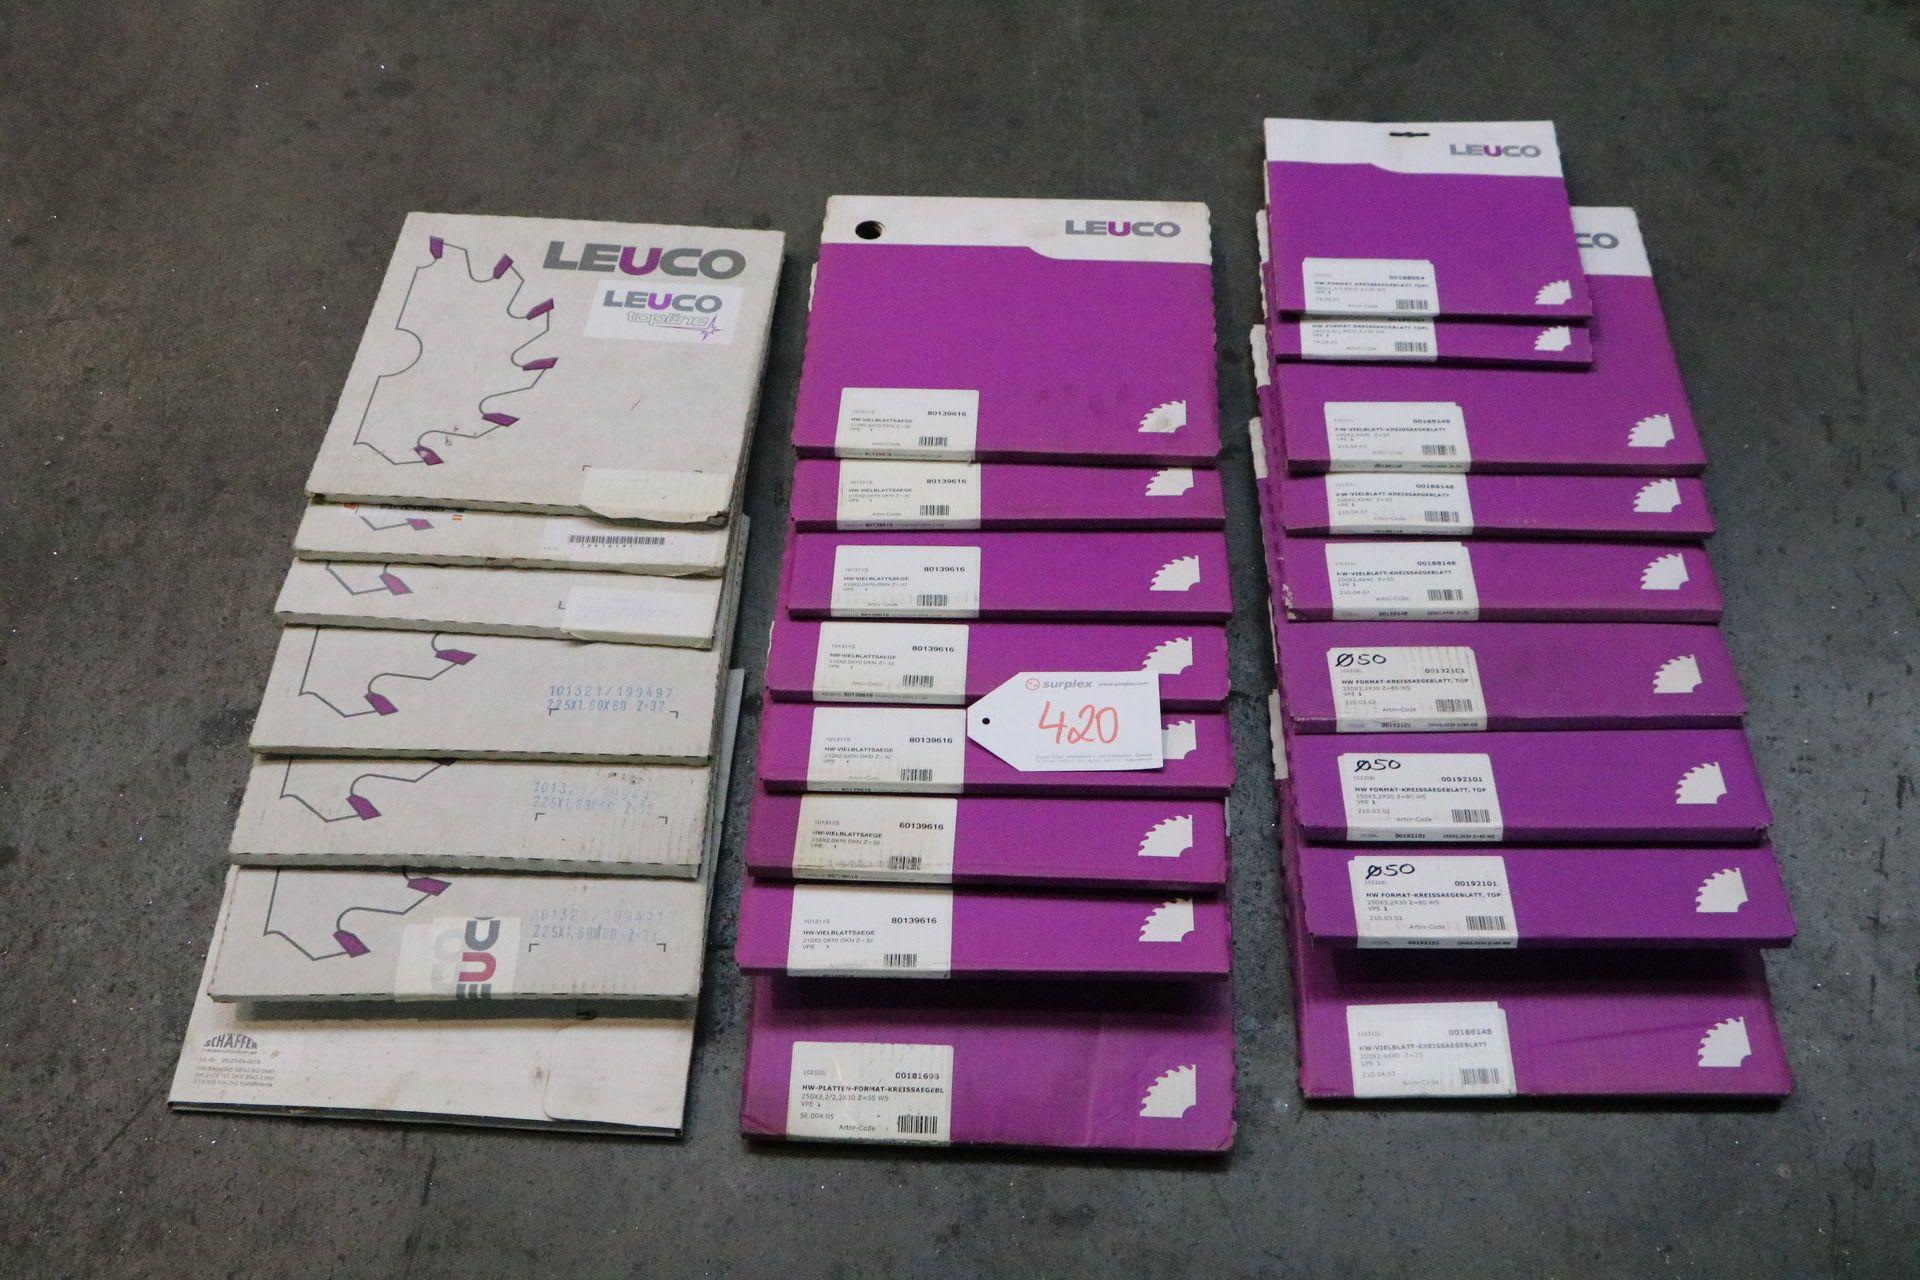 LEUCO Posten Sägeblätter